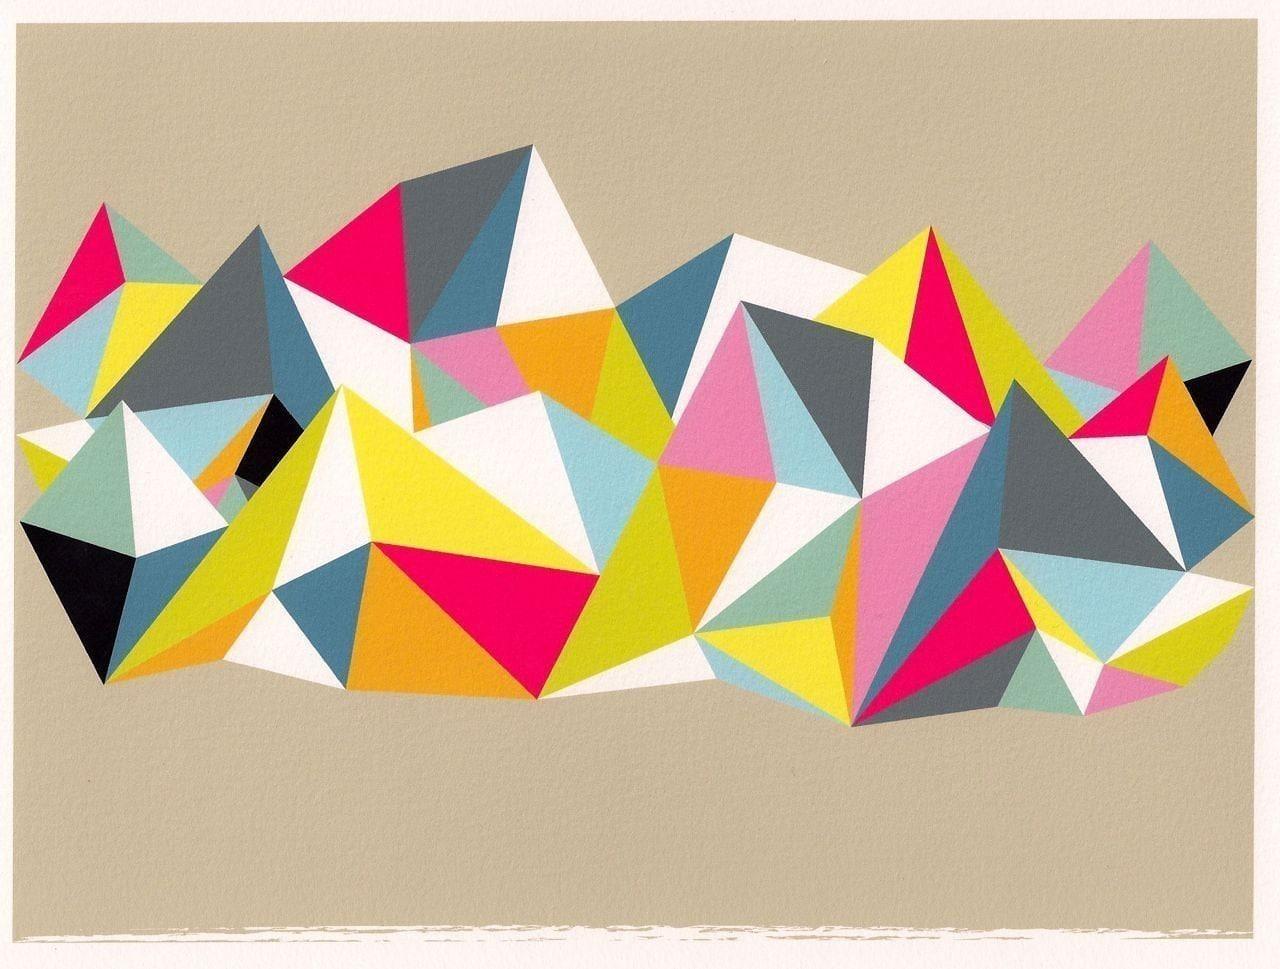 Abstract Art Geometric Print Wall Art Triangle Colorful